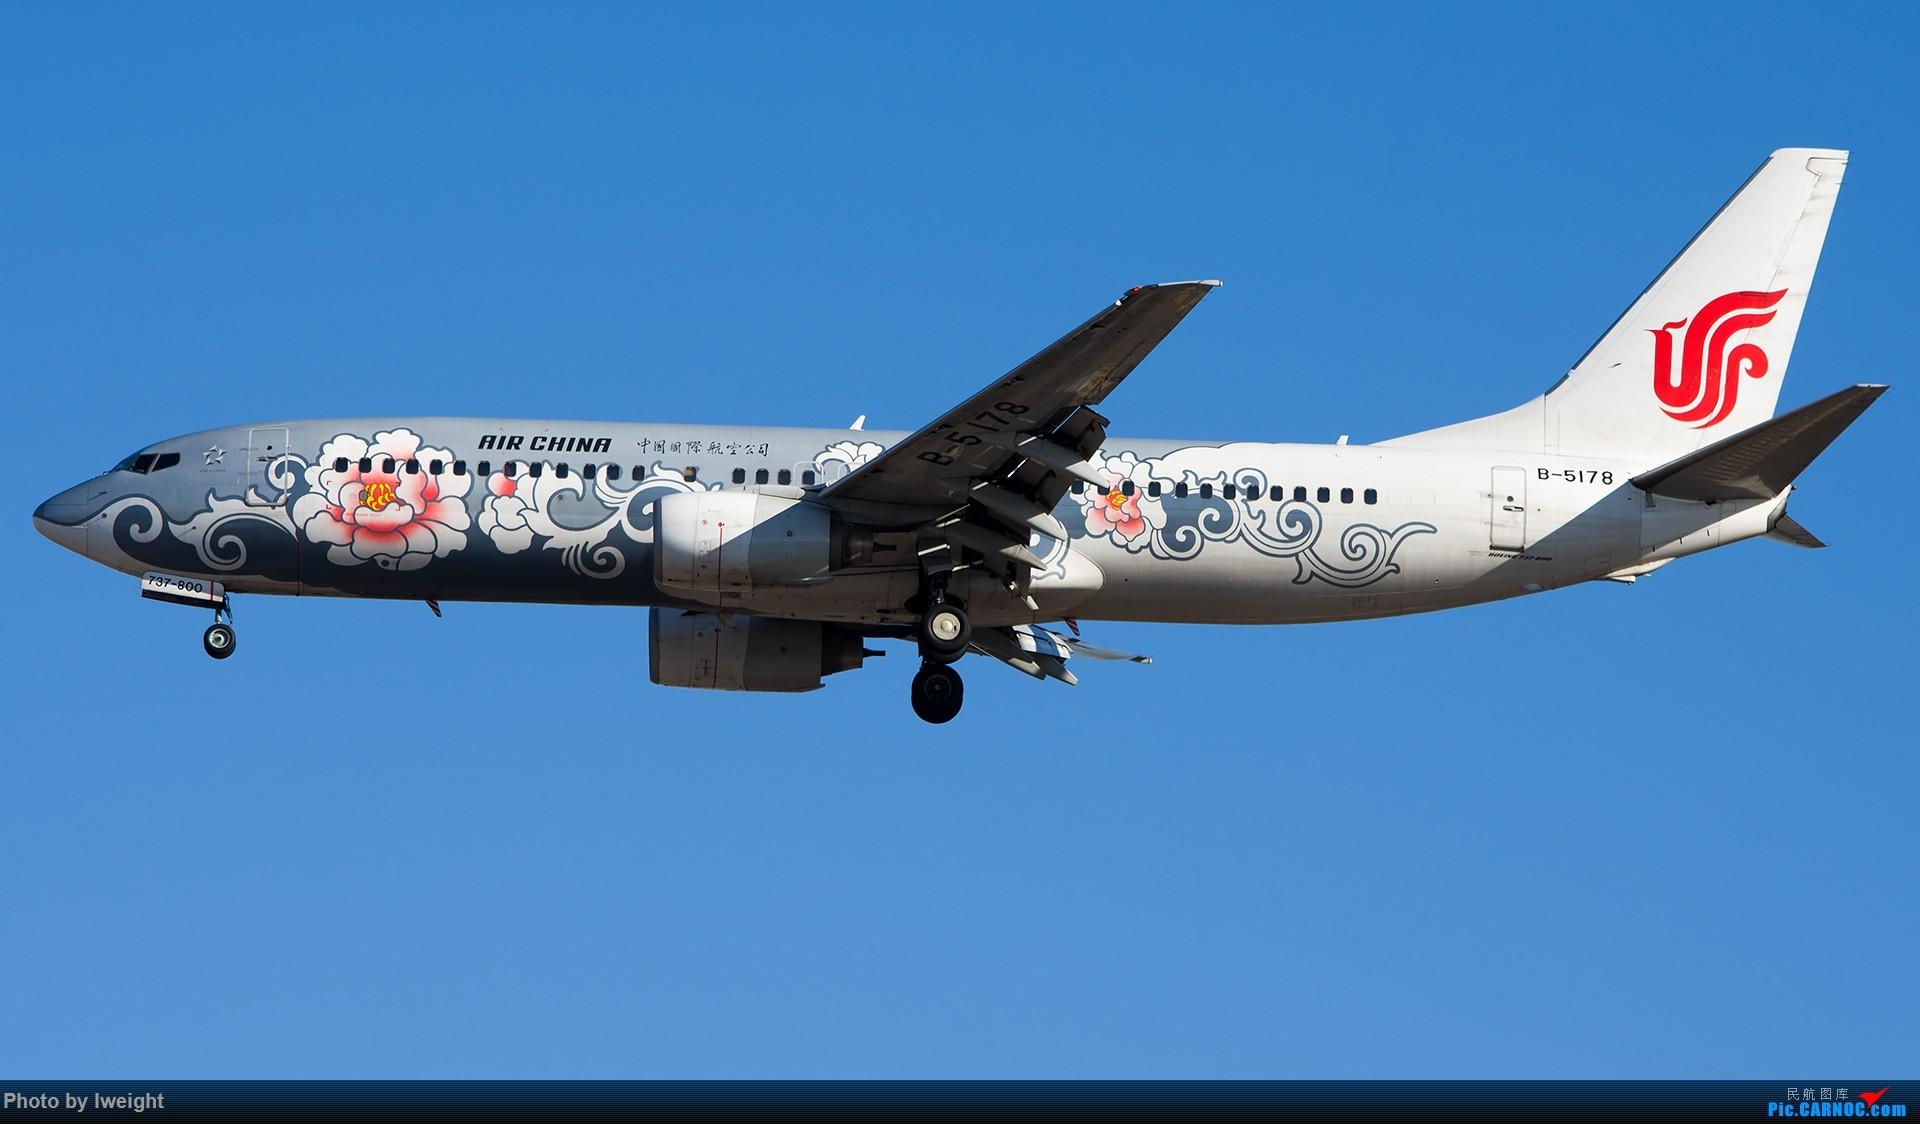 Re:[原创]终于在12月的北京等到了一个晴天的周末,出来拍拍飞机【2015-12-5】 BOEING 737-800 B-5178 中国北京首都国际机场